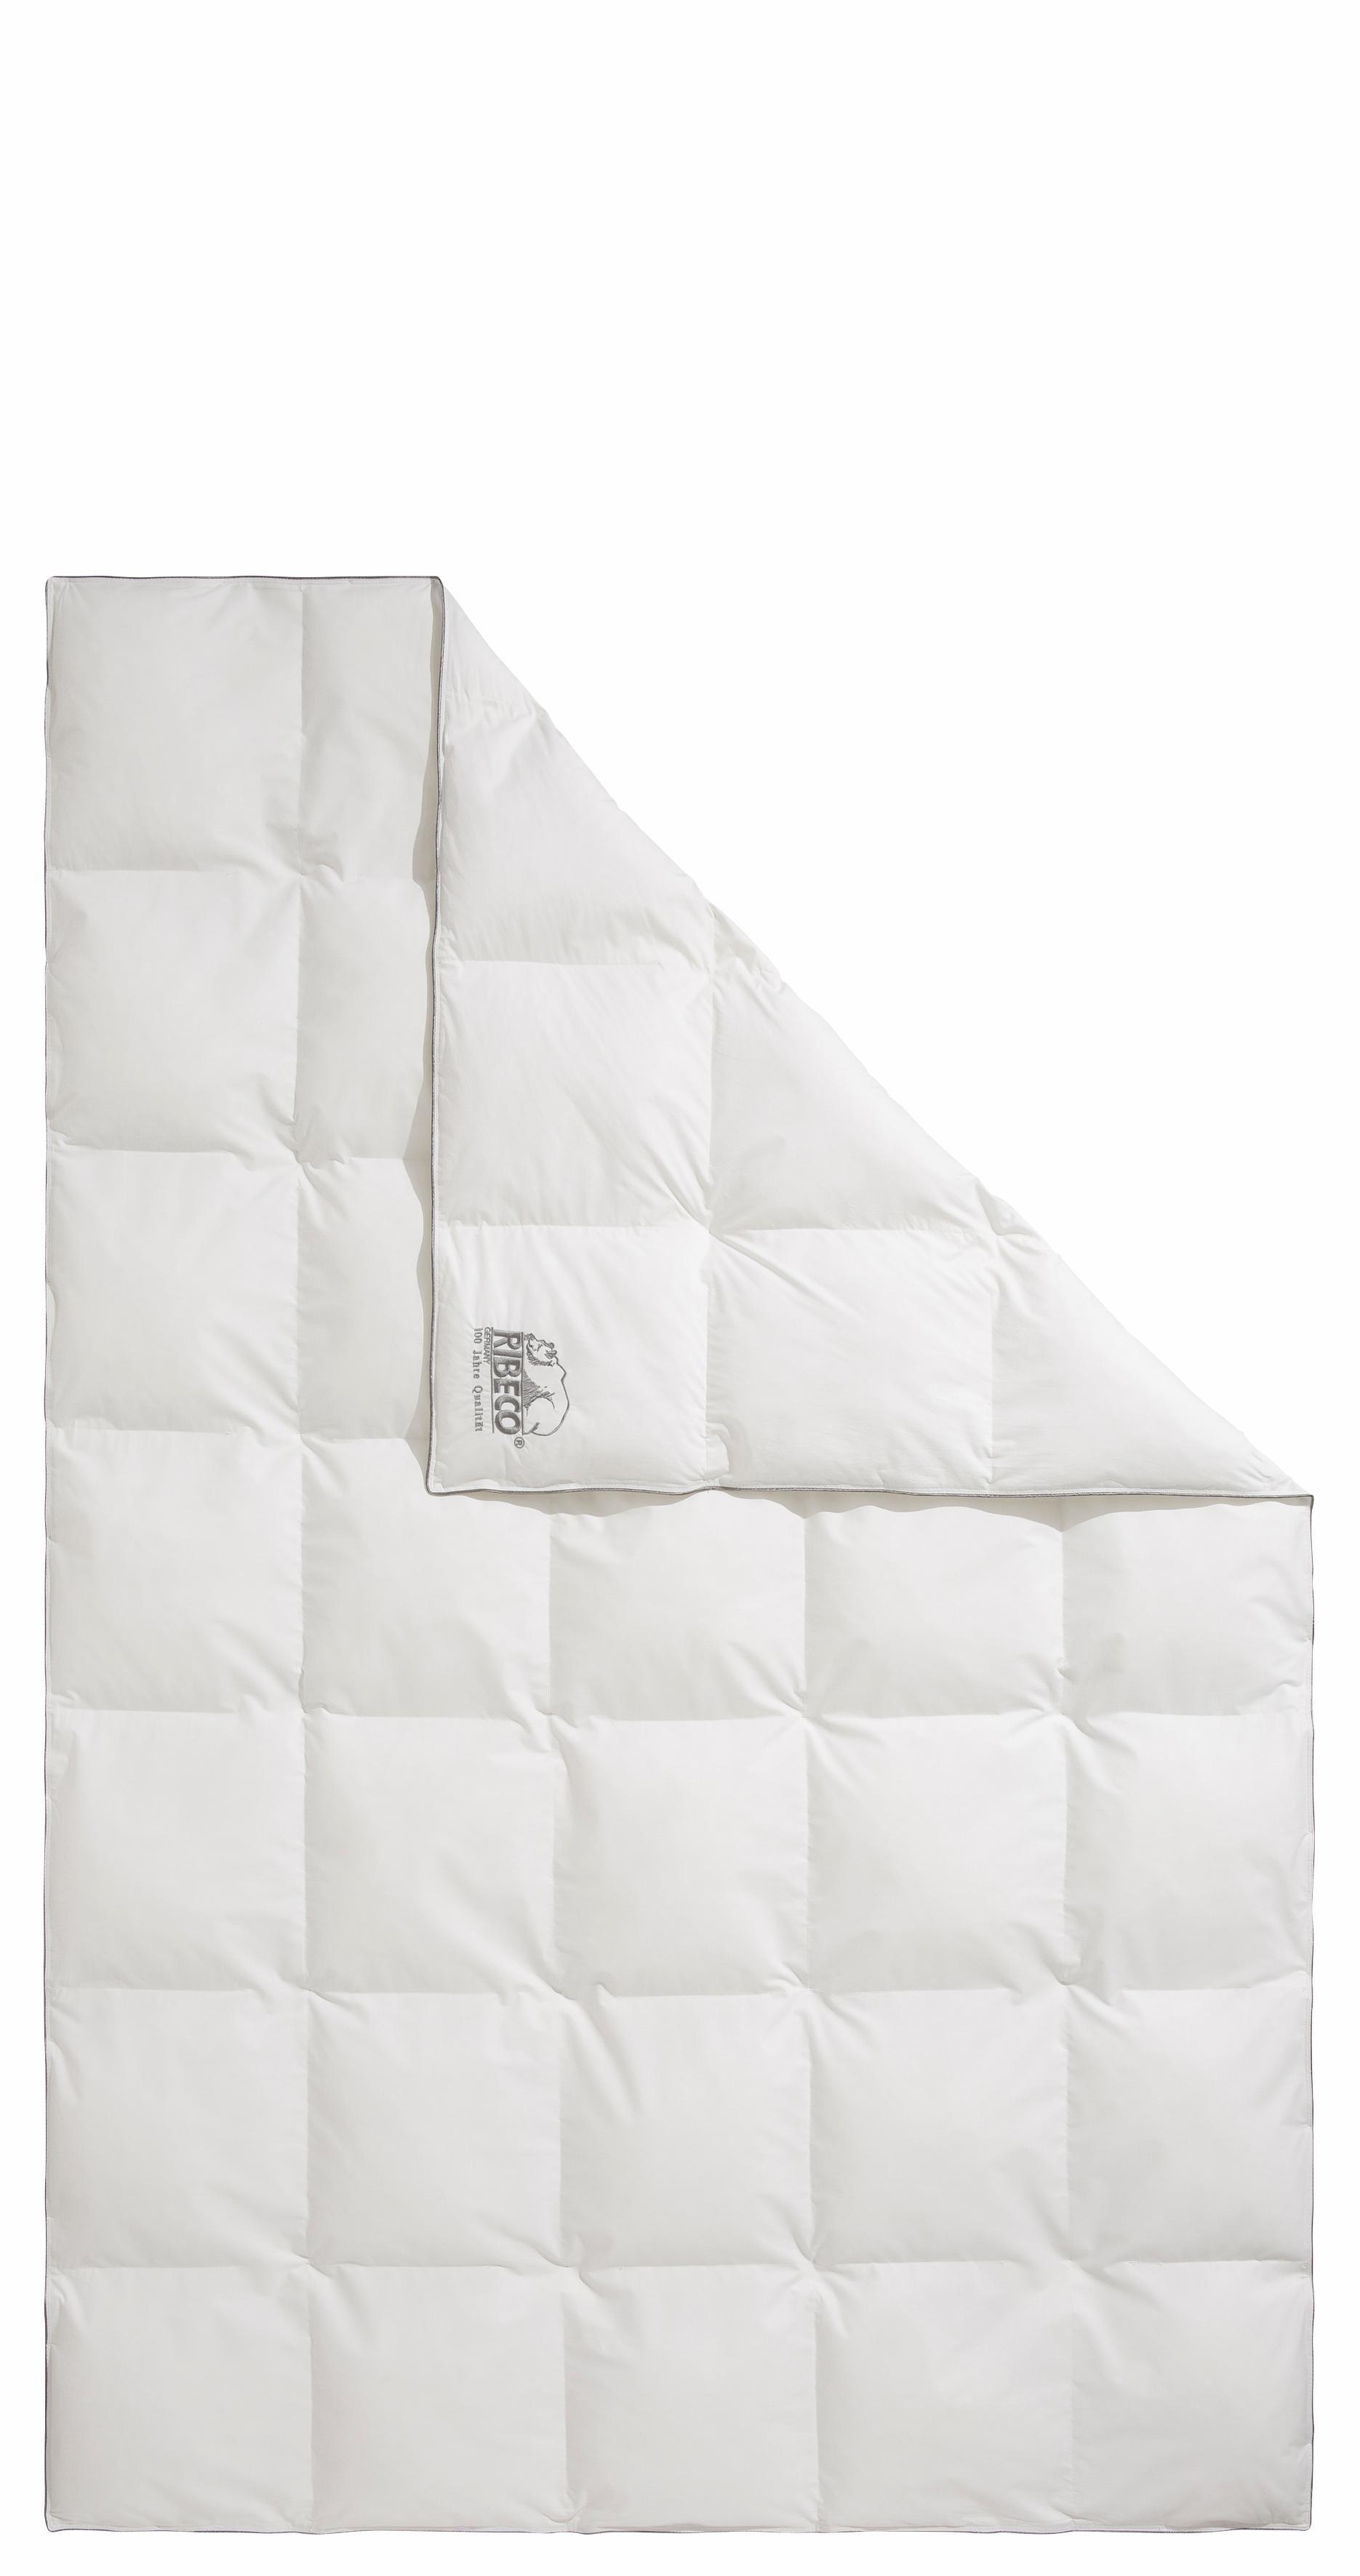 Kunstfaserbettdecke, »Marie«, RIBECO, normal, (1-tlg) | Heimtextilien > Decken und Kissen > Bettdecken | RIBECO